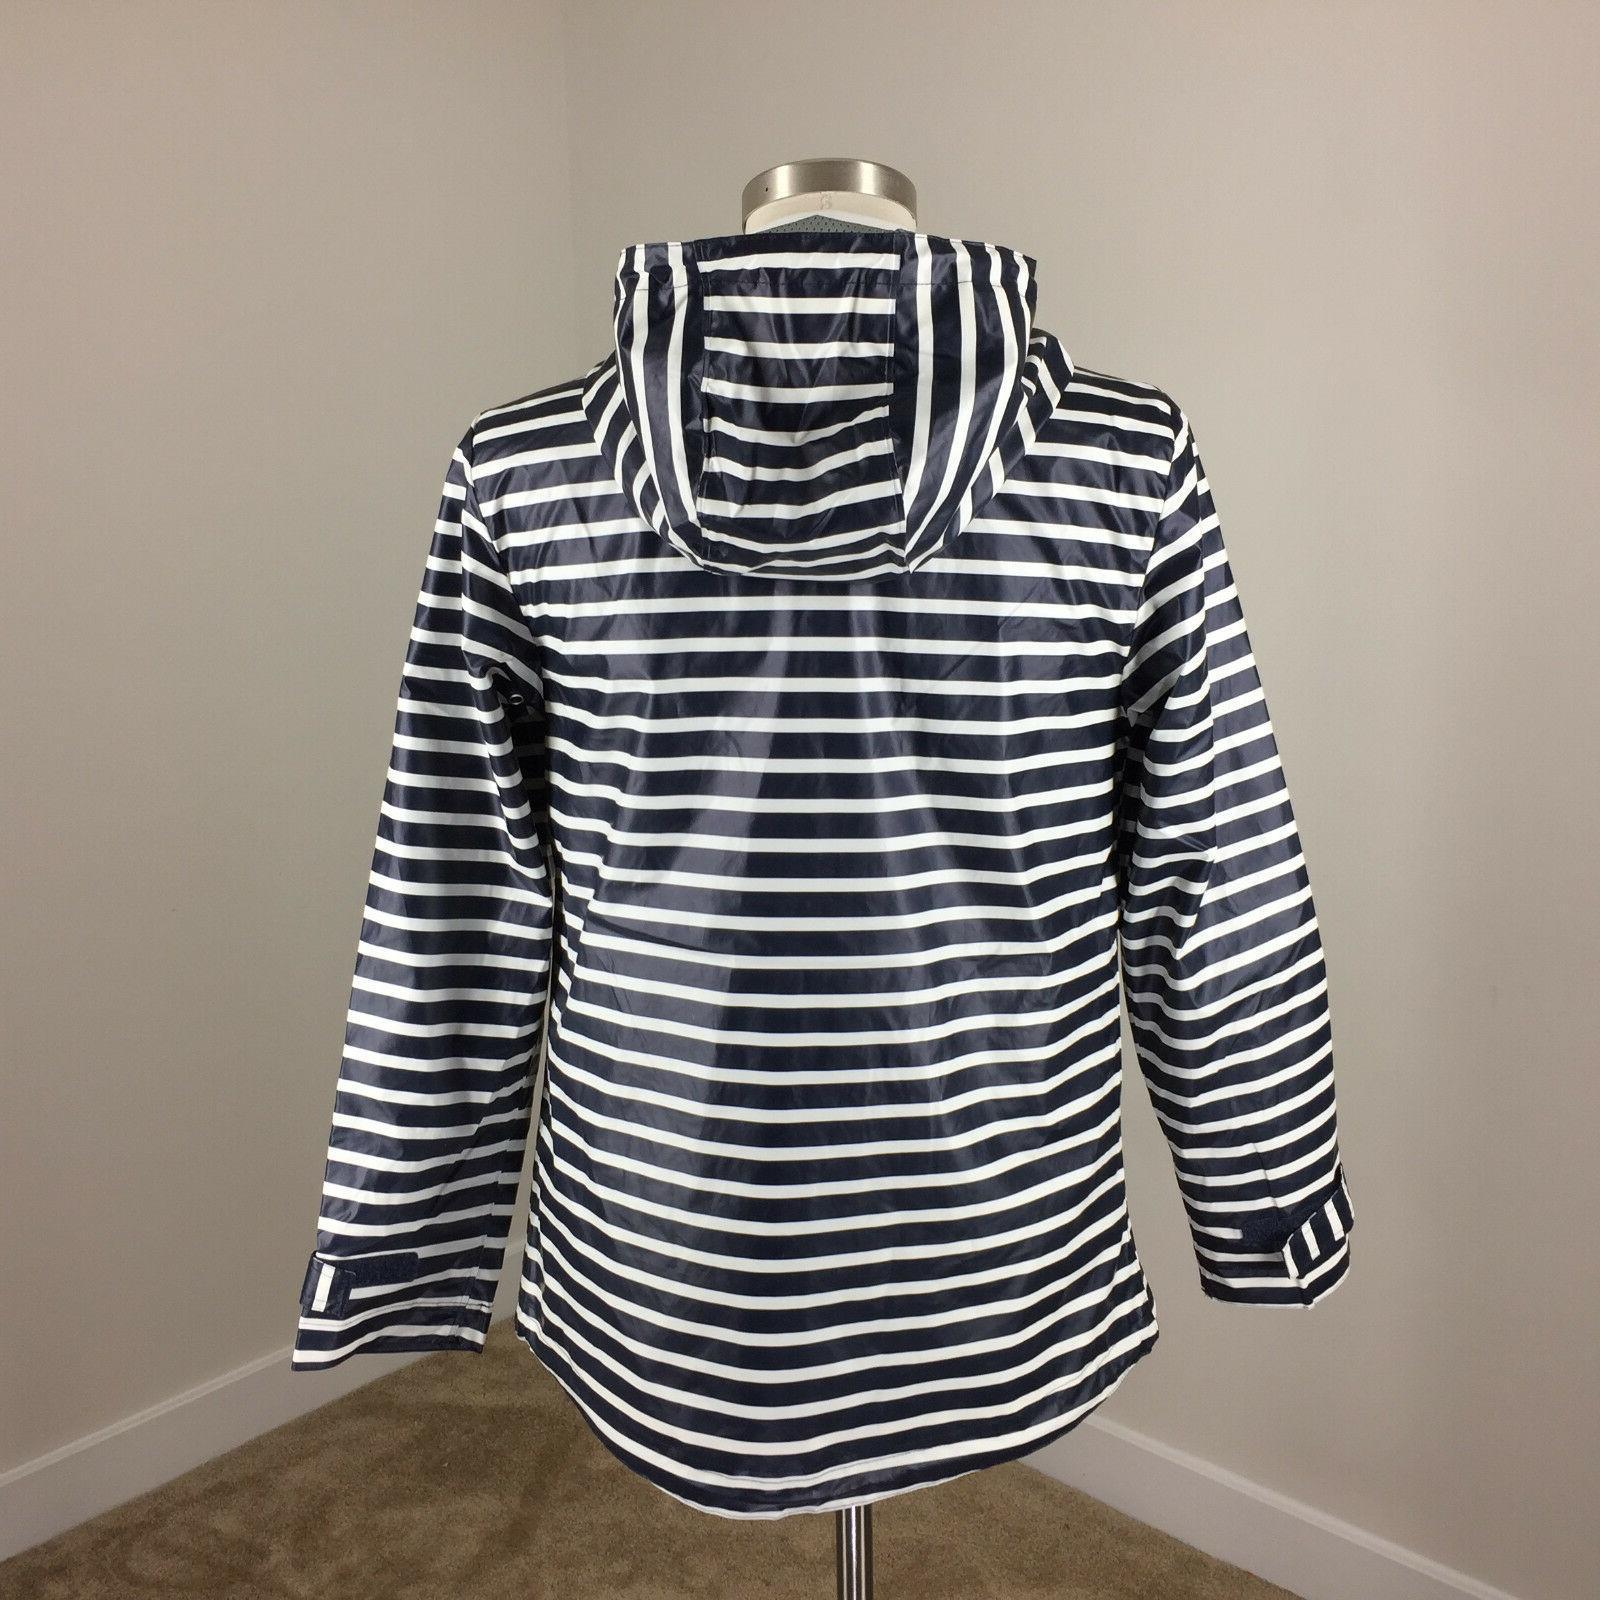 New River The Navy White Stripe Rain Coat Jacket